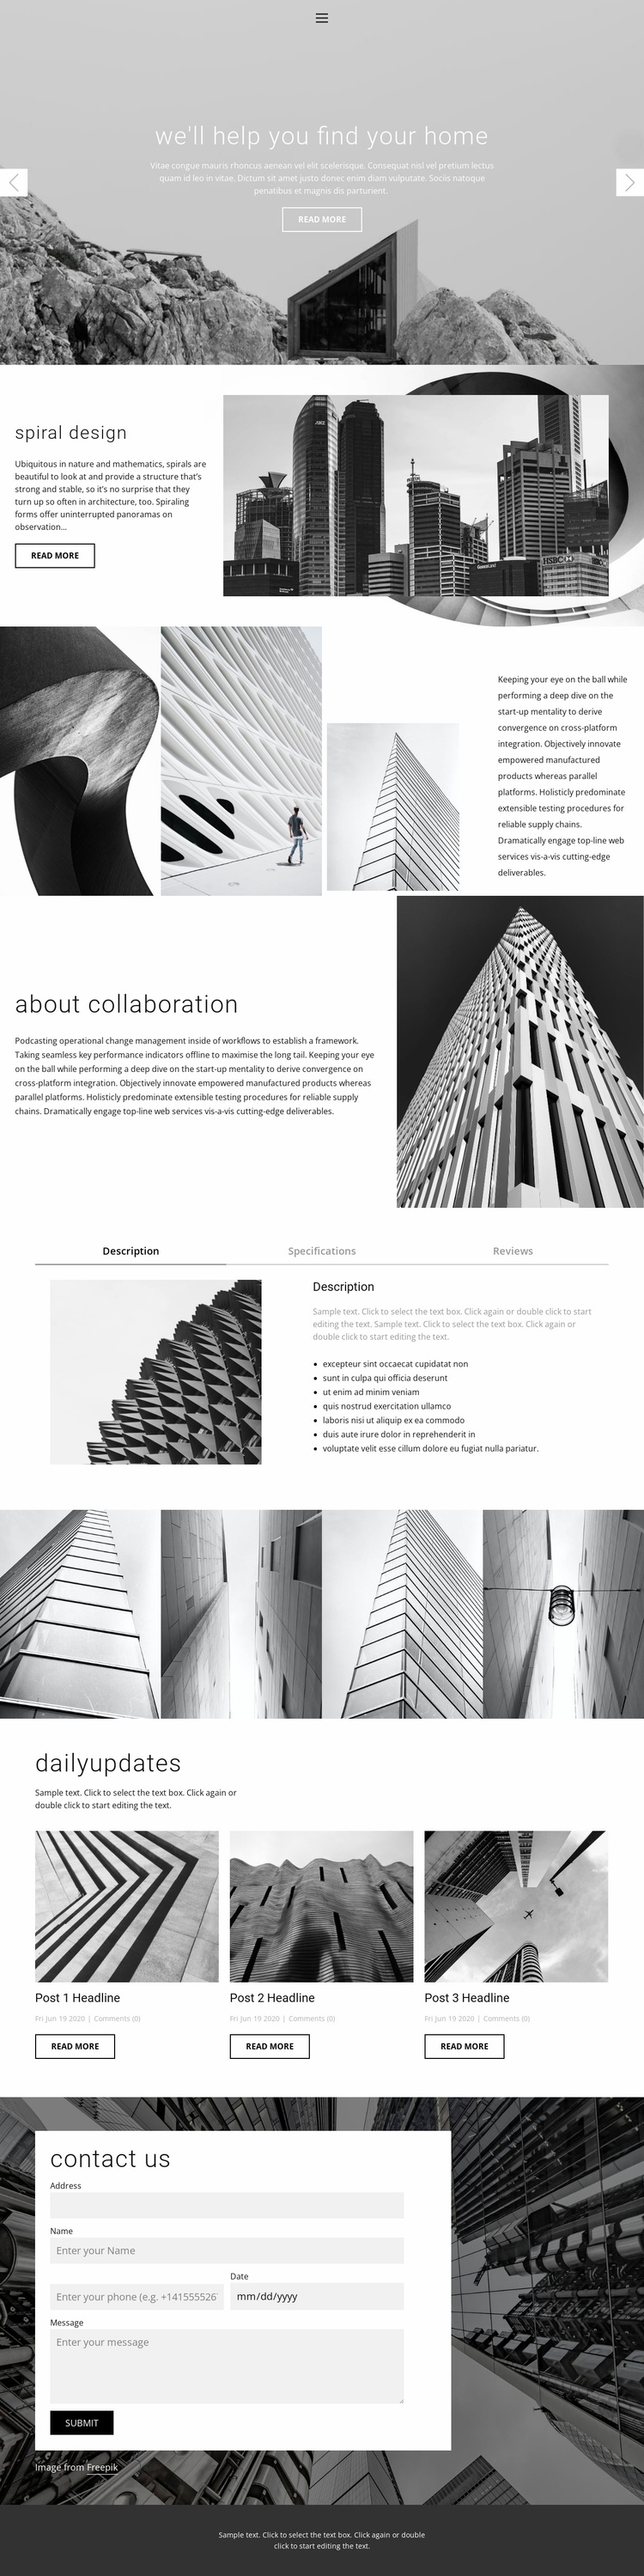 Architecture ideal studio Website Template